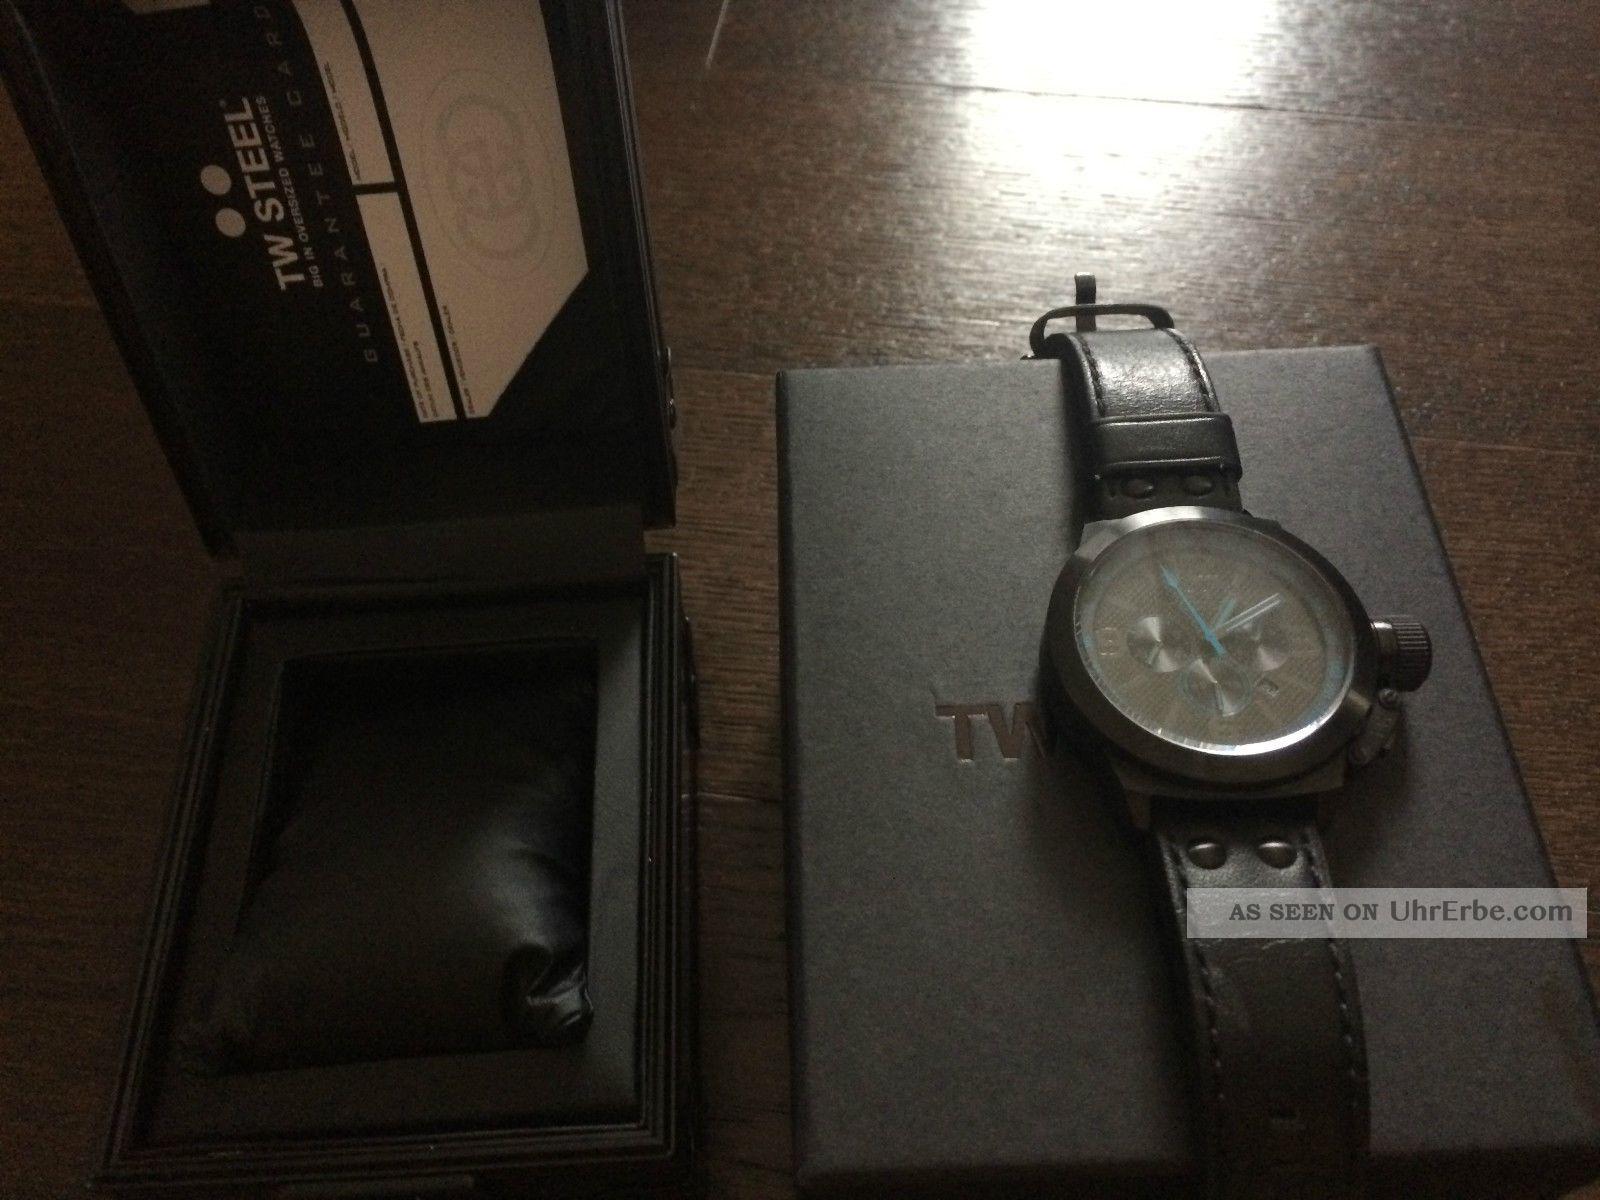 Tw Steel Canteen Style Chrono Tw - 904 Xl Uhr 45 Mm Armbanduhren Bild